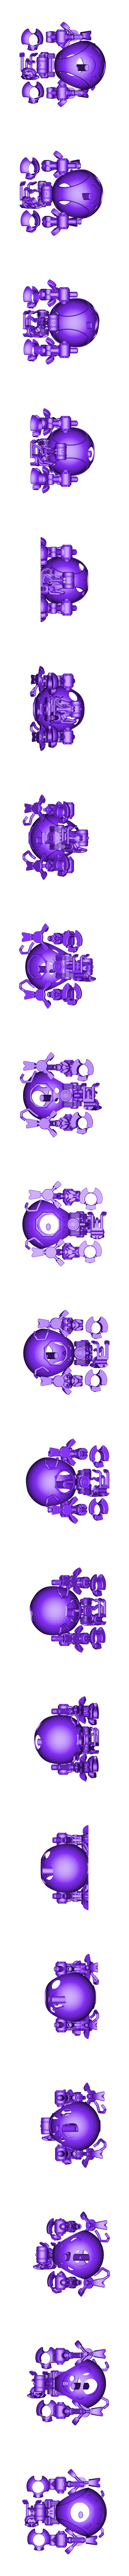 full-plate.stl Download free STL file Pod Walker • 3D printing object, ferjerez3d